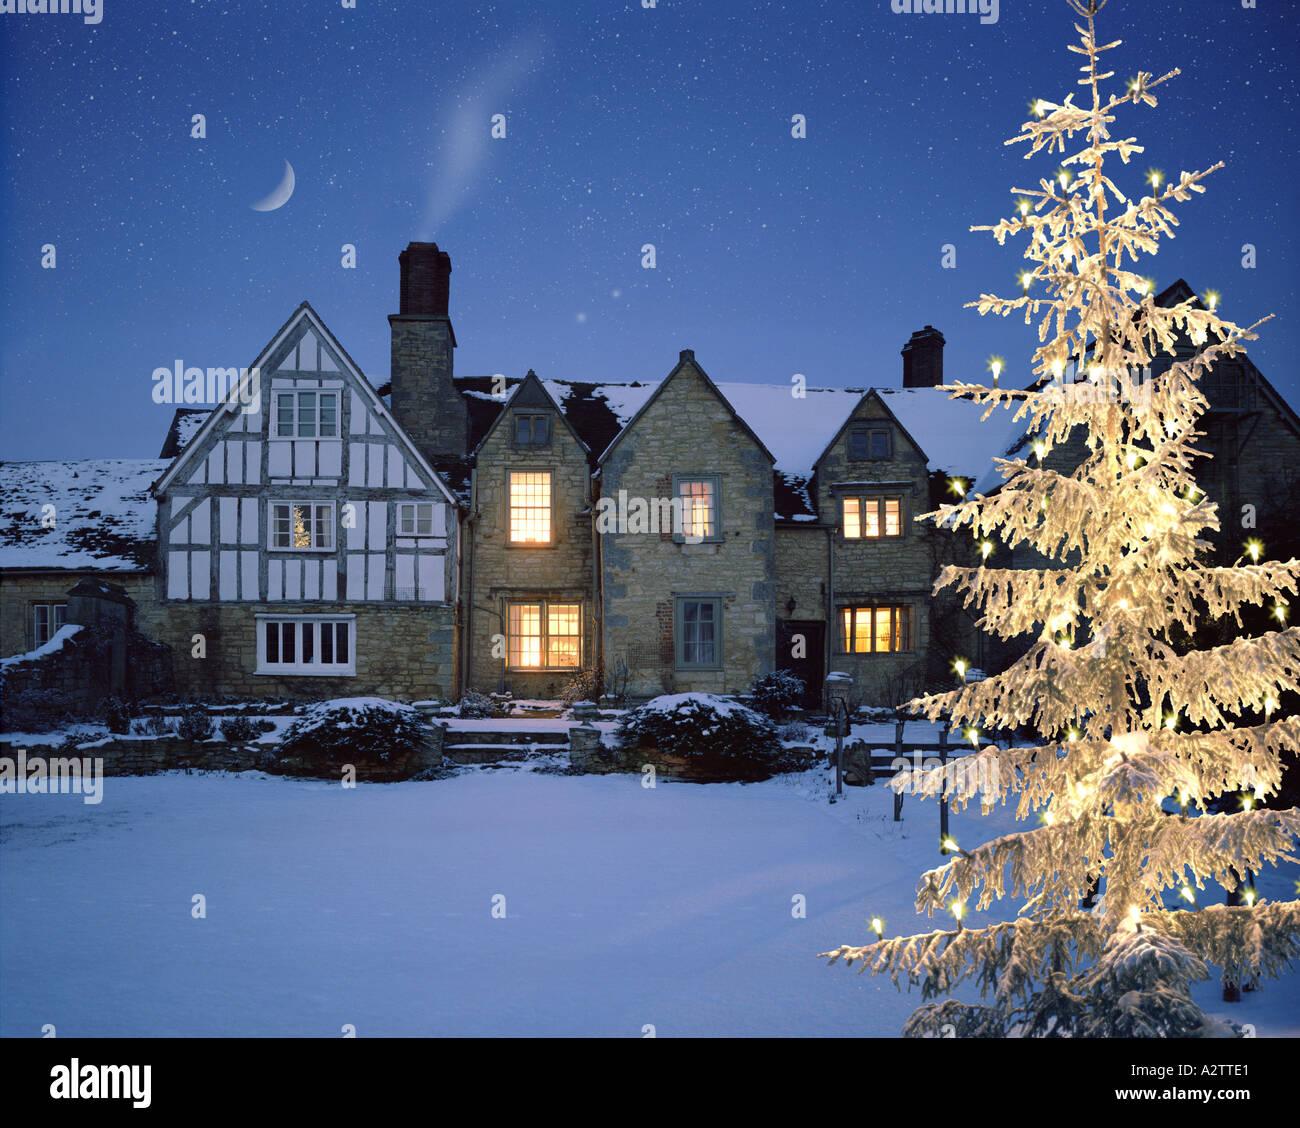 GB - WORCESTERSHIRE: The Manor at Bredons Norton near Tewkesbury - Stock Image